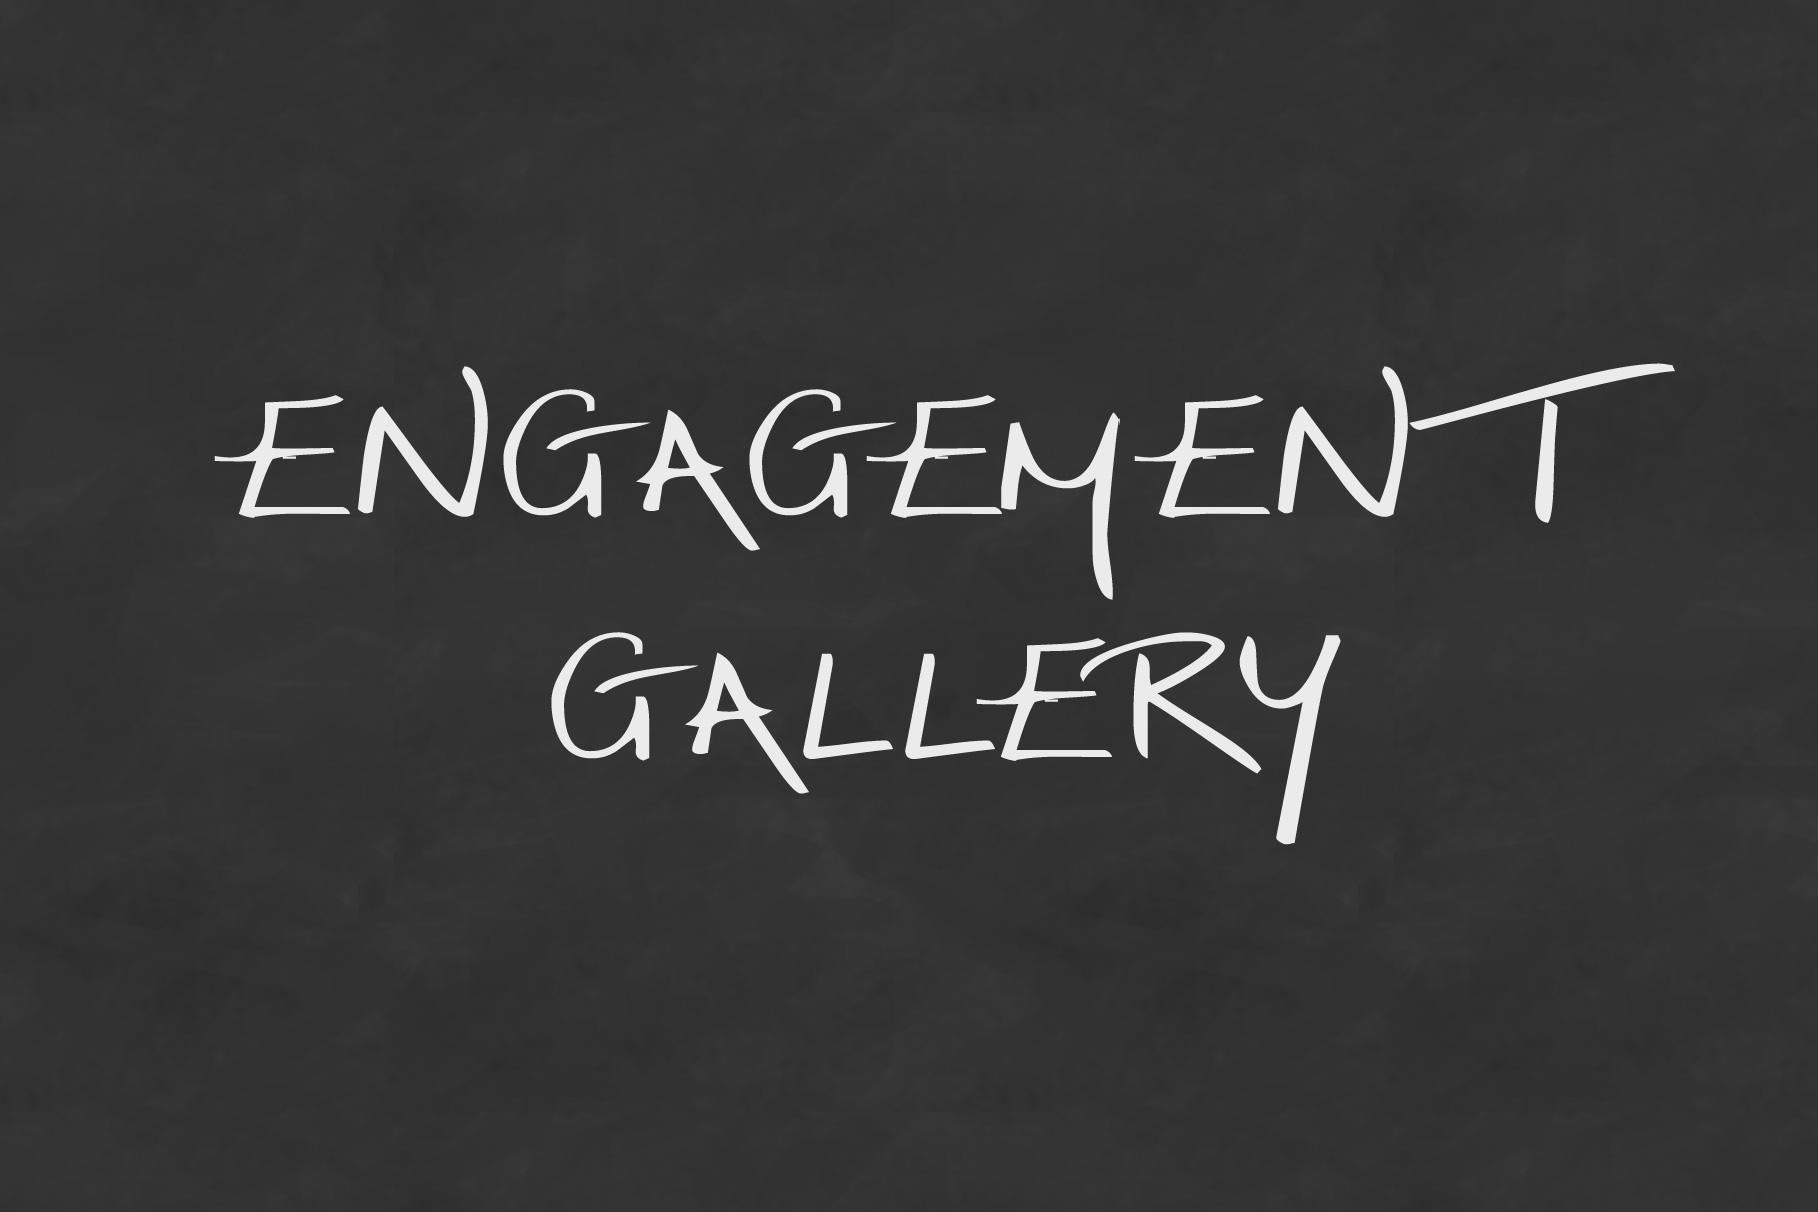 EngagementGallery.jpg